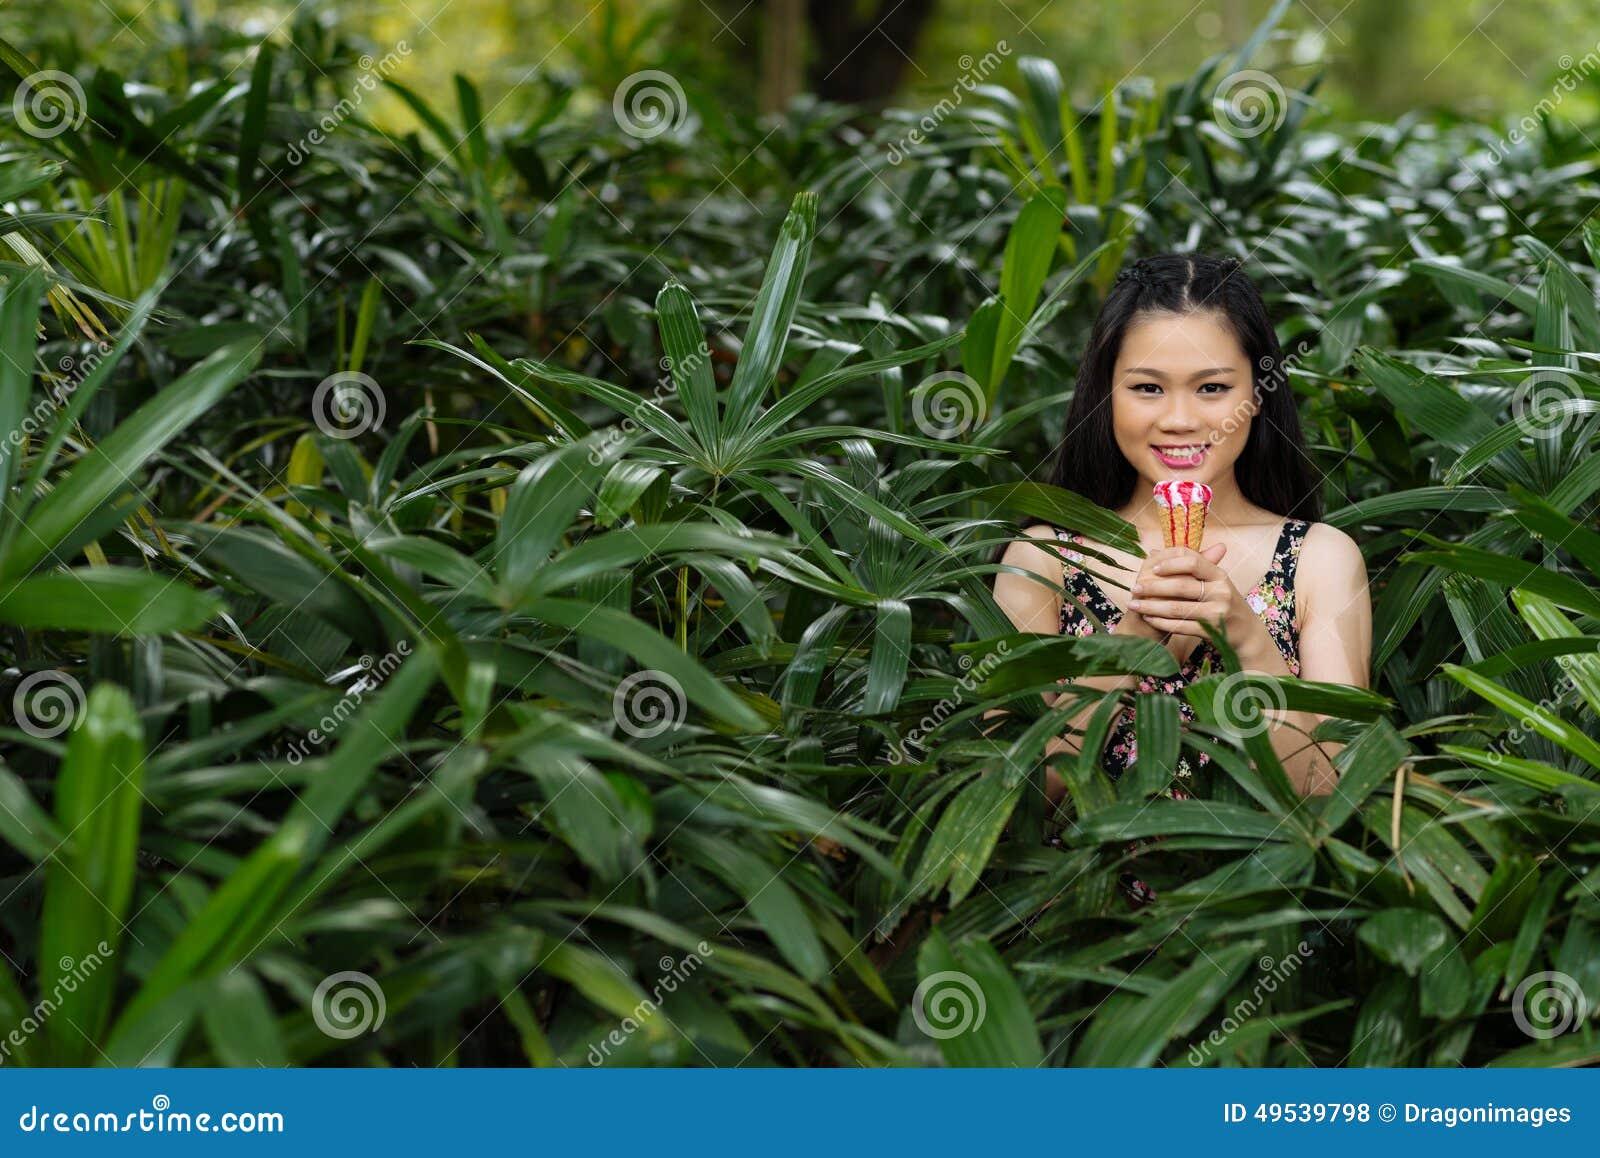 girls bushes